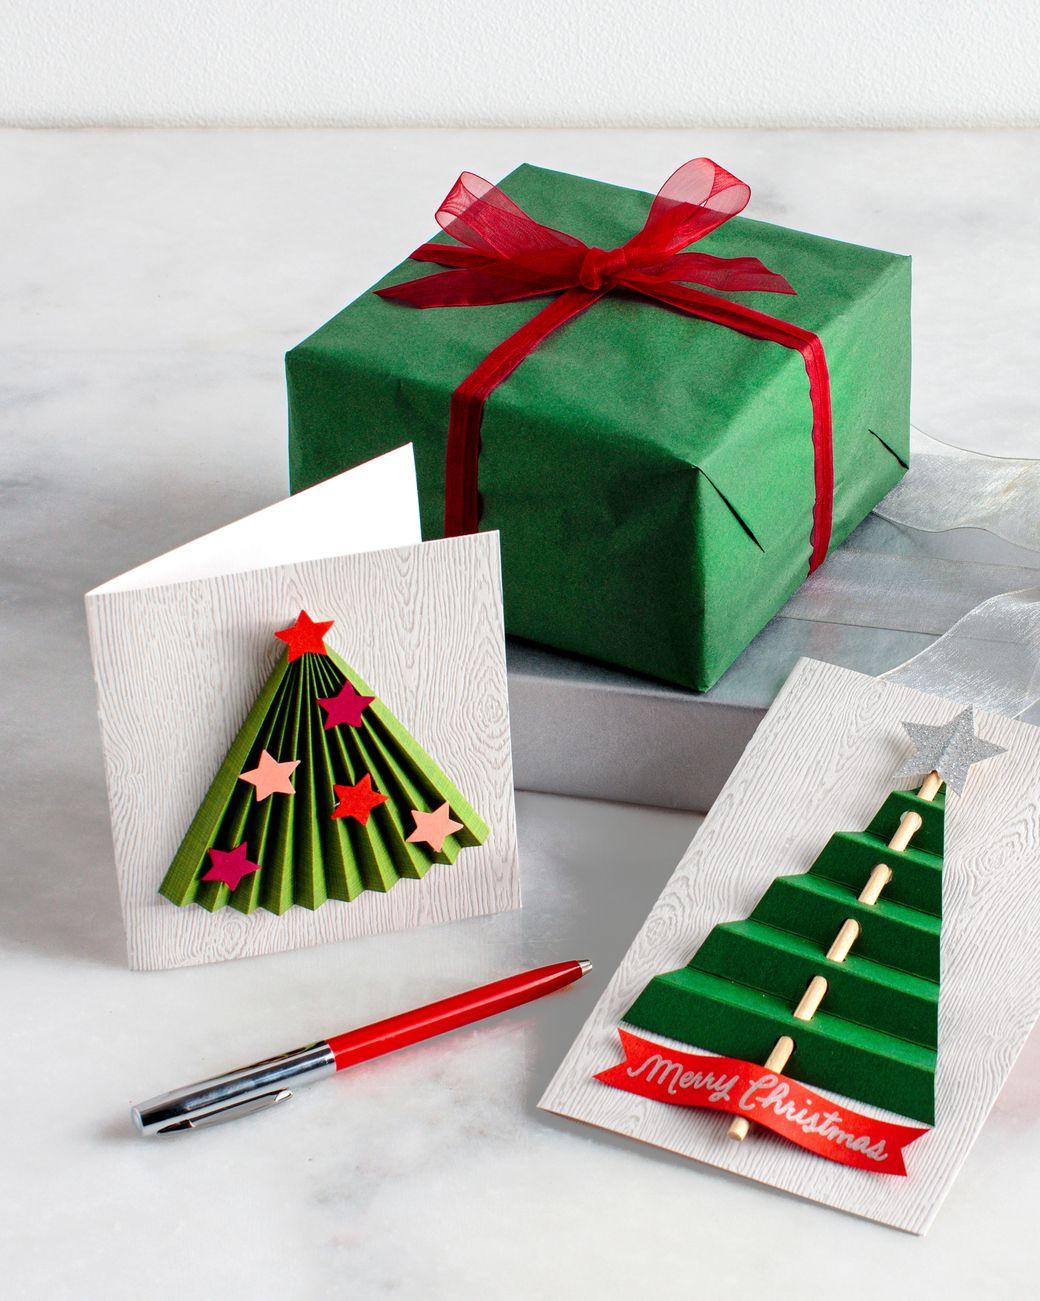 Weihnachtskarten Selber Machen 15 Diy Ideen Anleitung